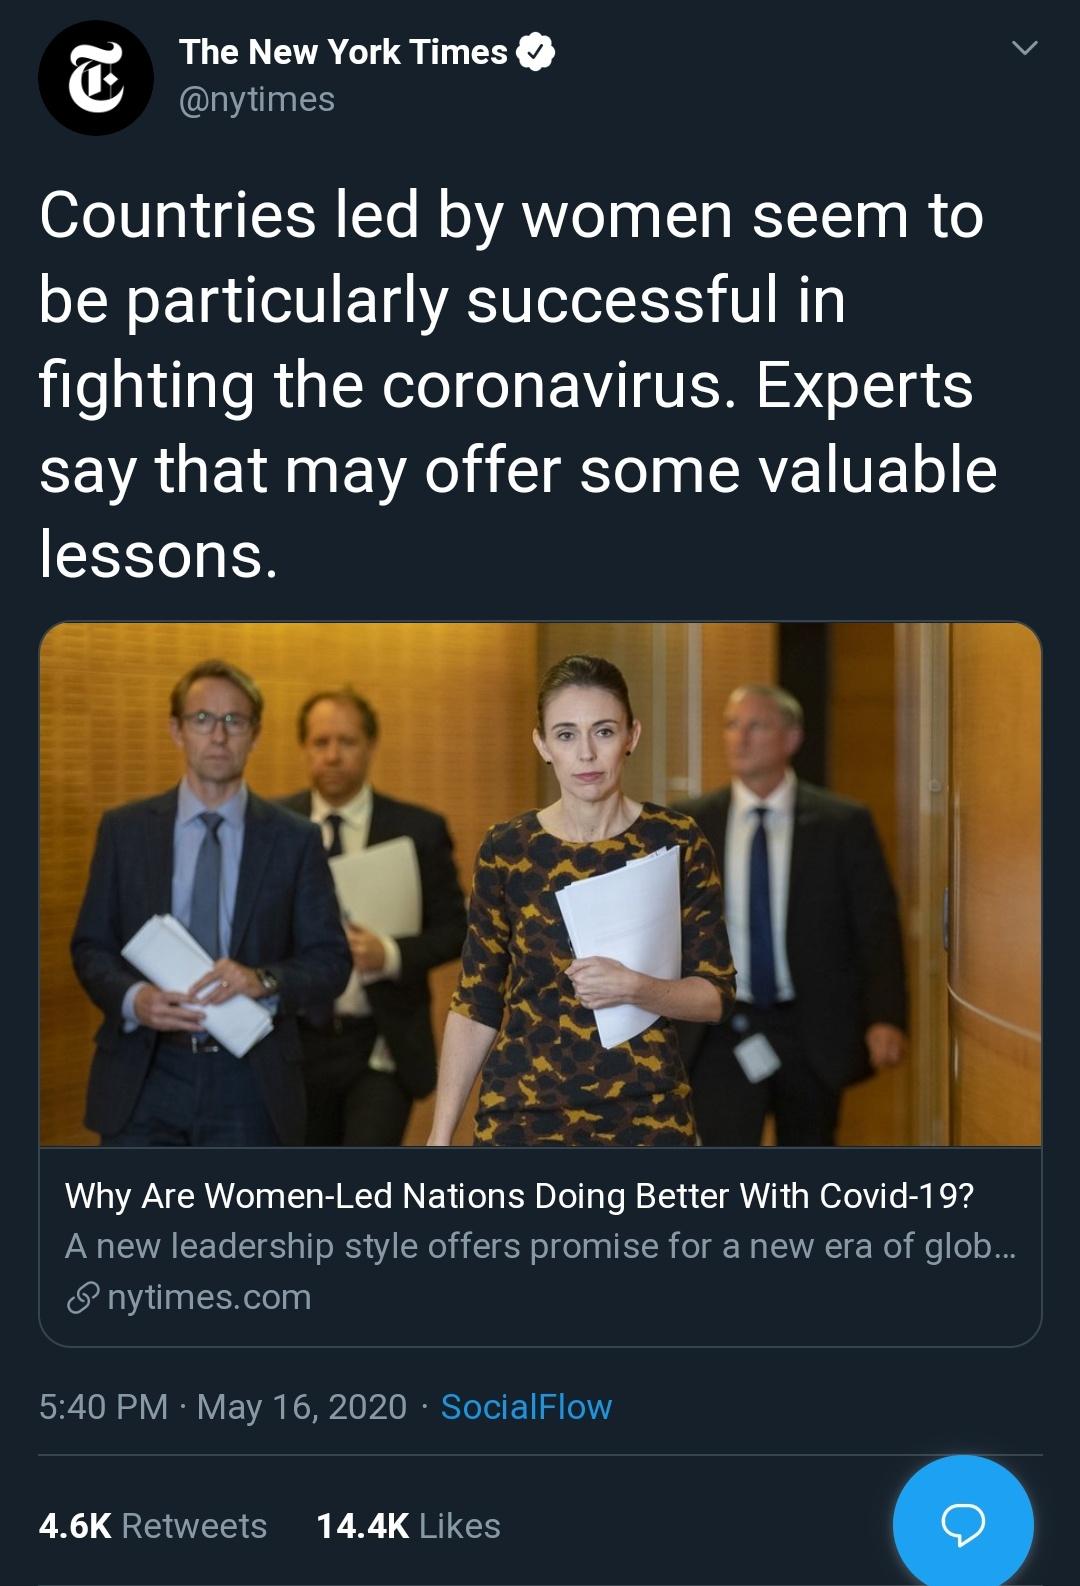 New York times female led Nations good coronavirus response fake news